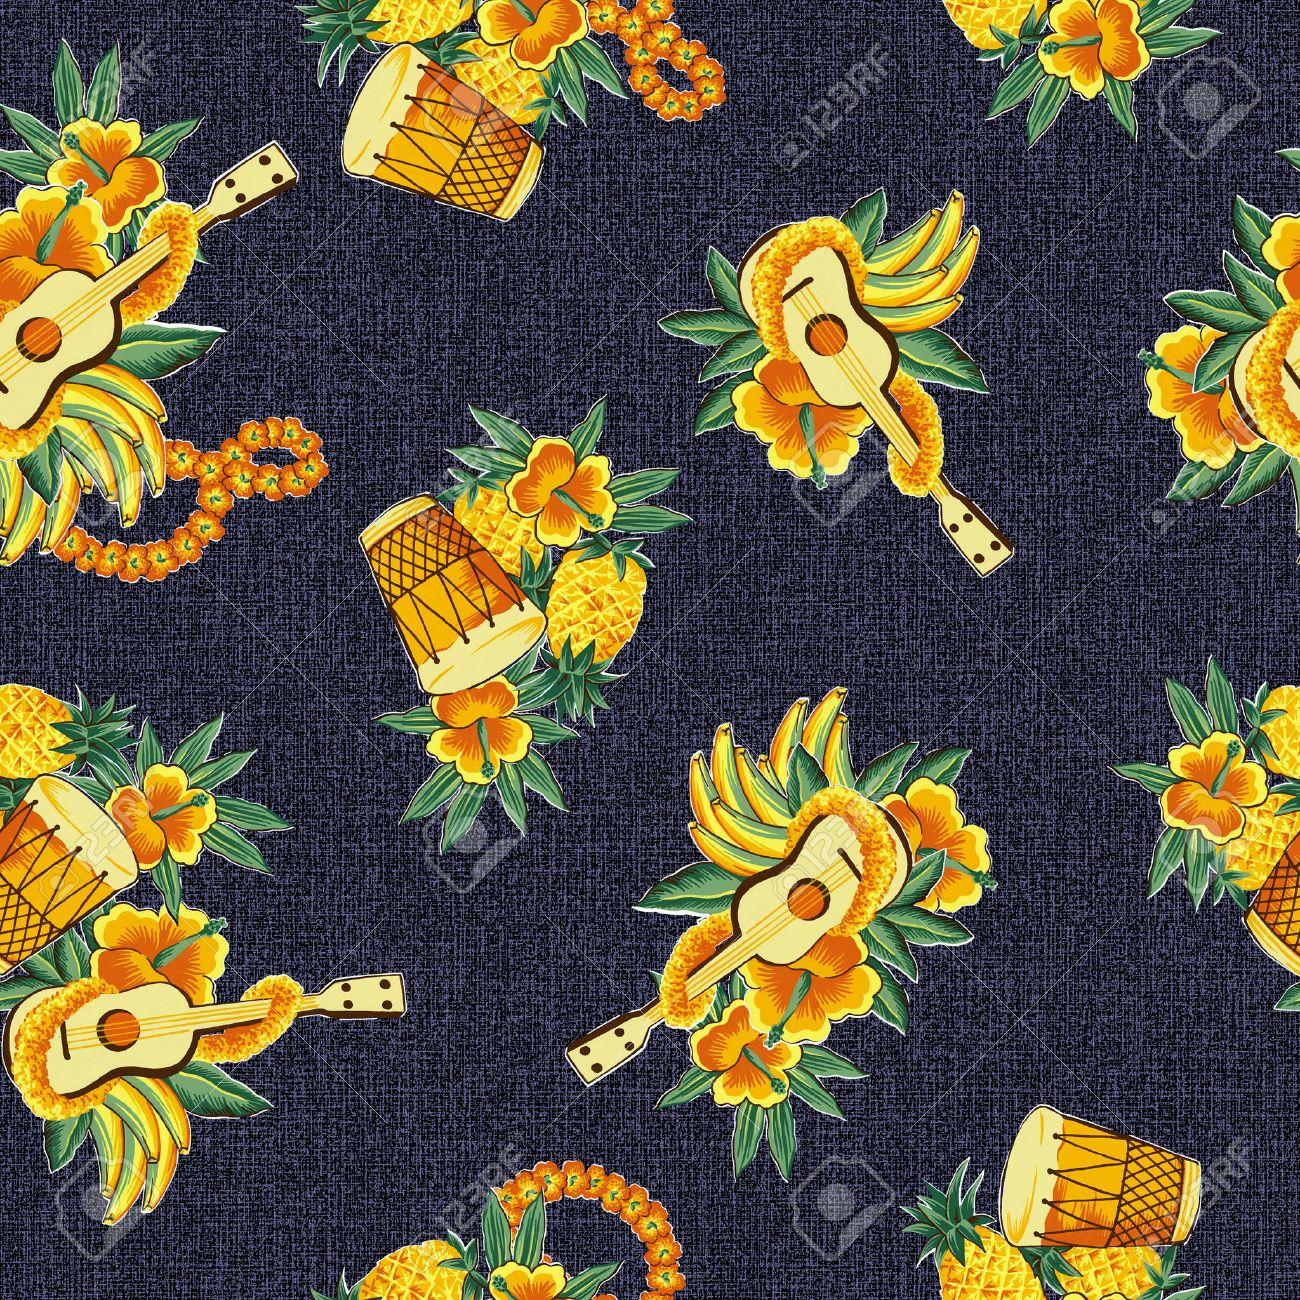 90 Hawaiian Drums Stock Vector Illustration And Royalty Free ...